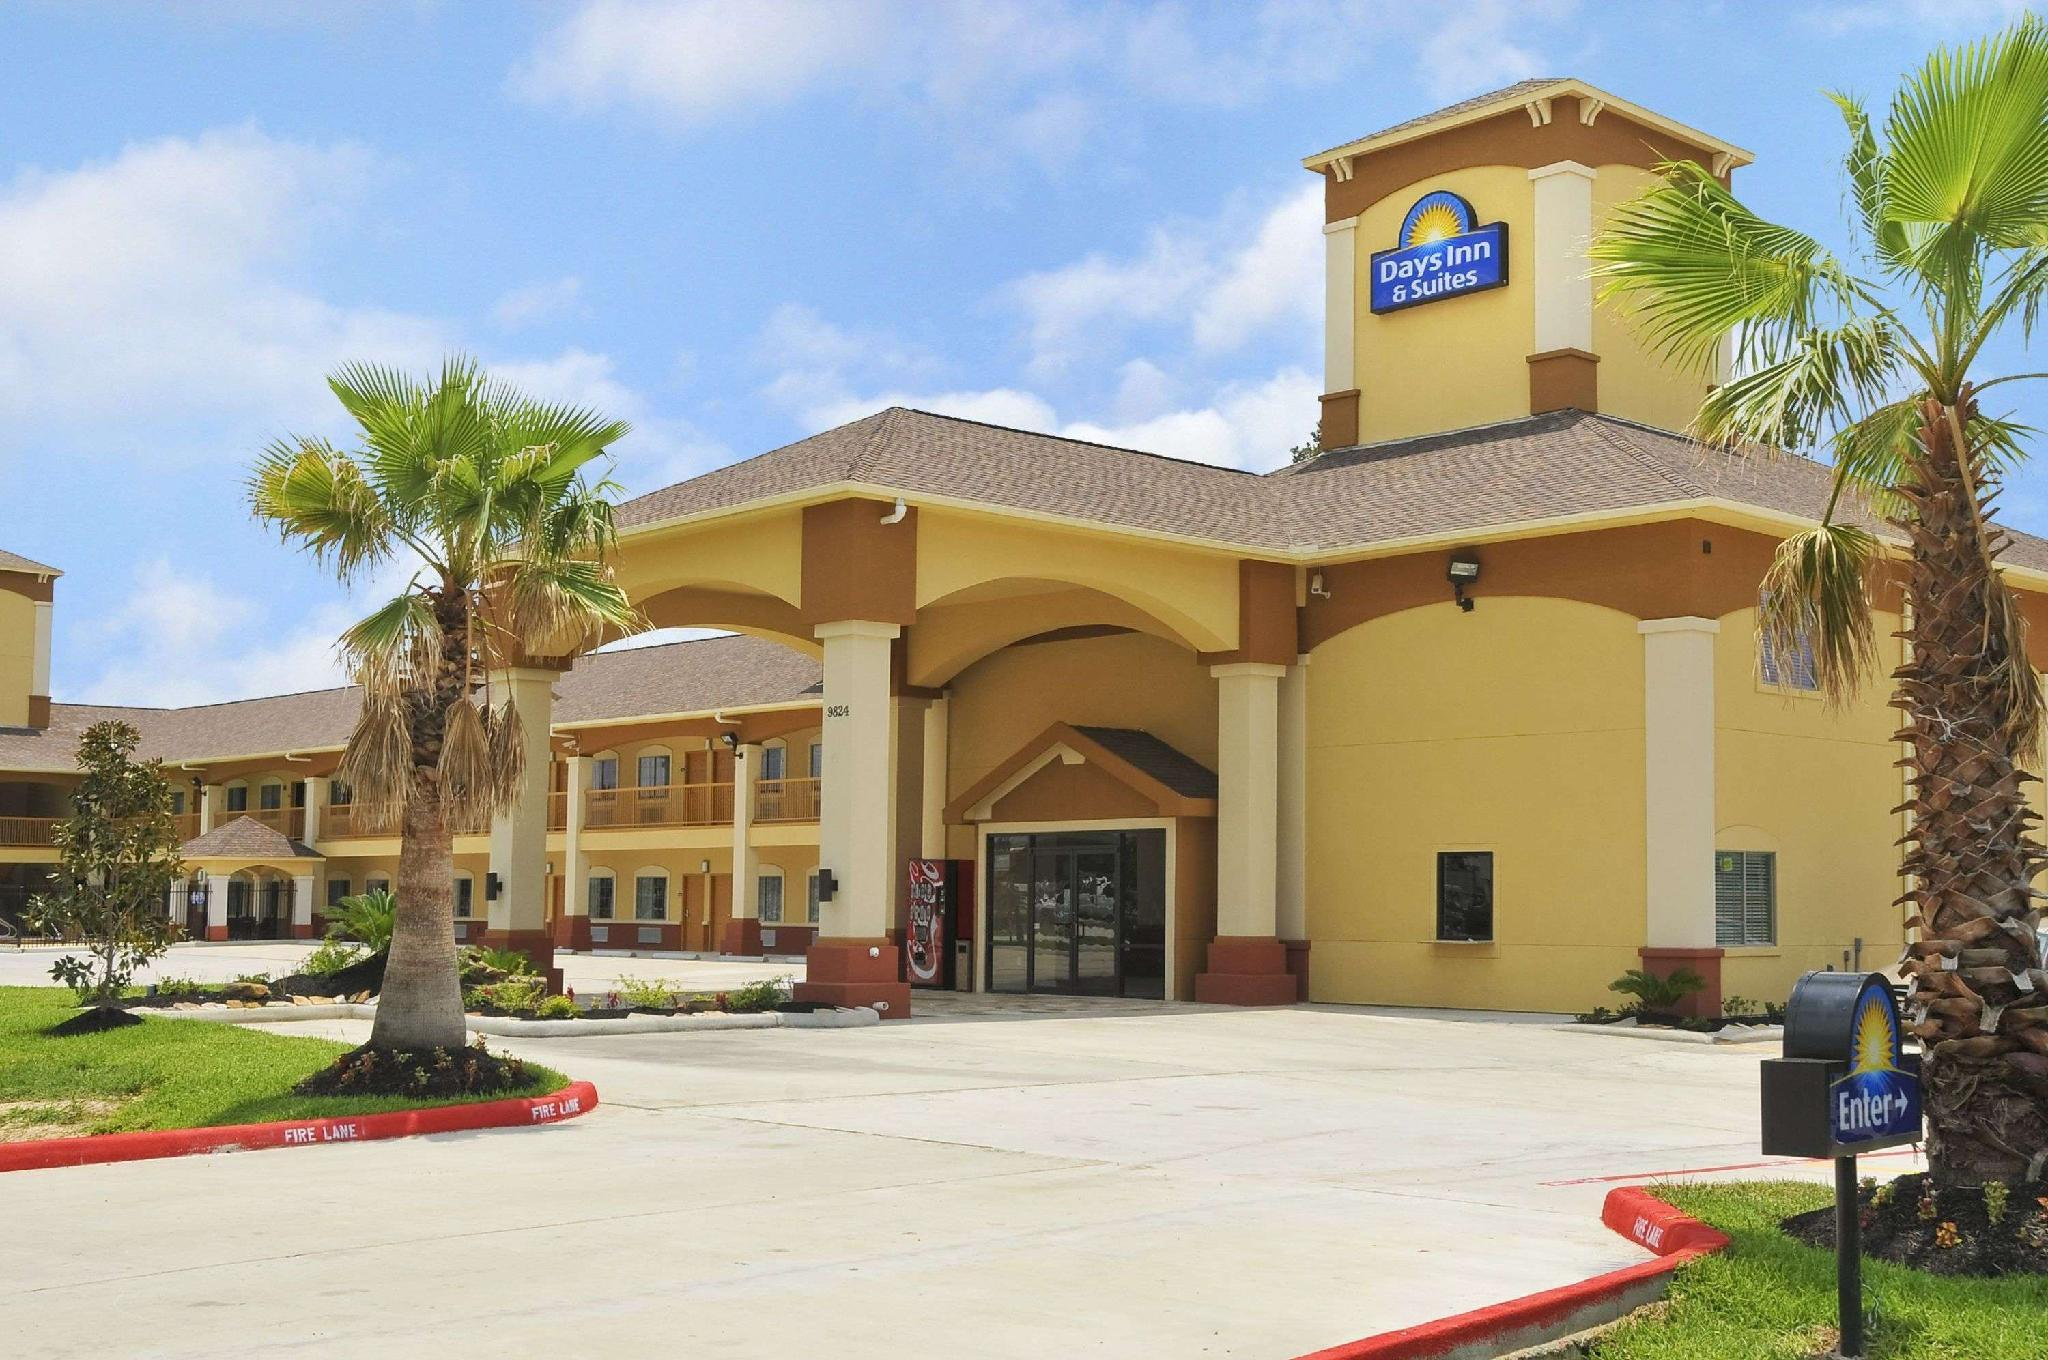 Days Inn By Wyndham Humble Houston Intercontinental Airport